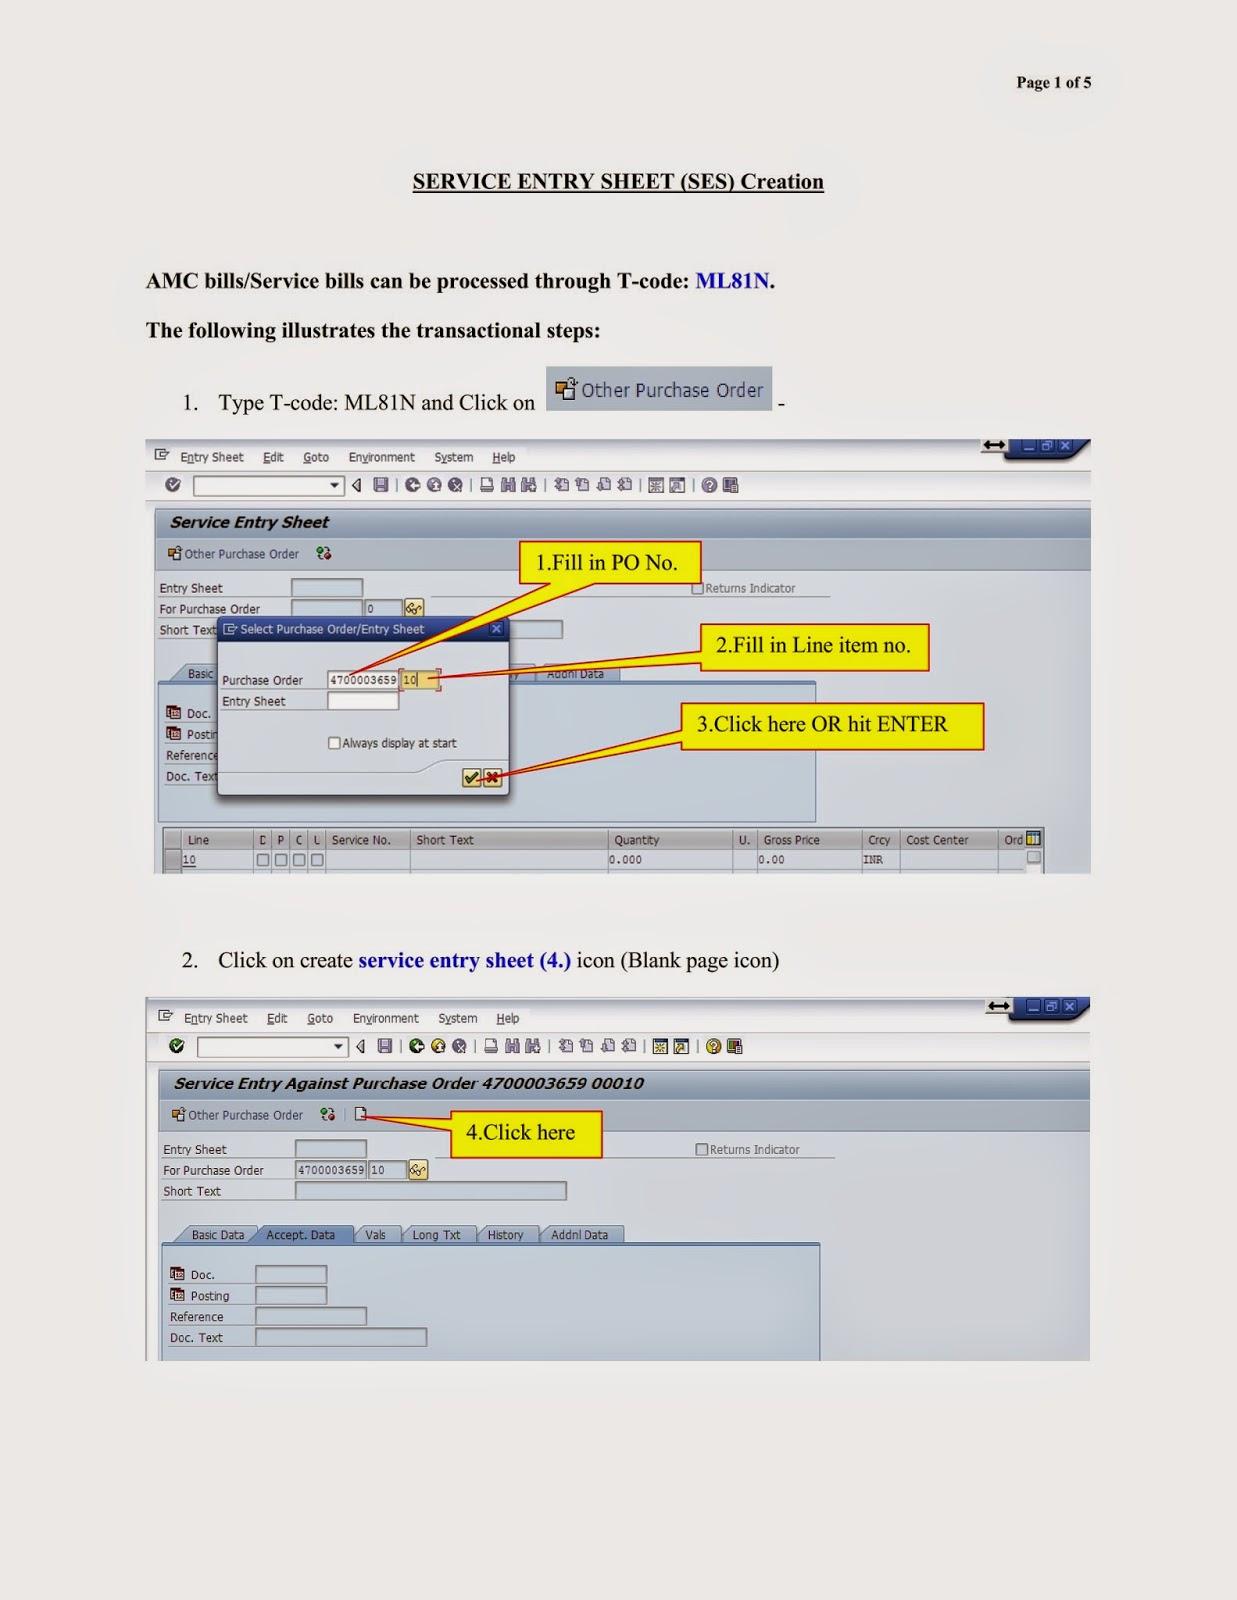 sap pm mm module tips for bsnl erp end users end user manual for rh vvrksarma blogspot com mm user manual in sap mm user manual in sap